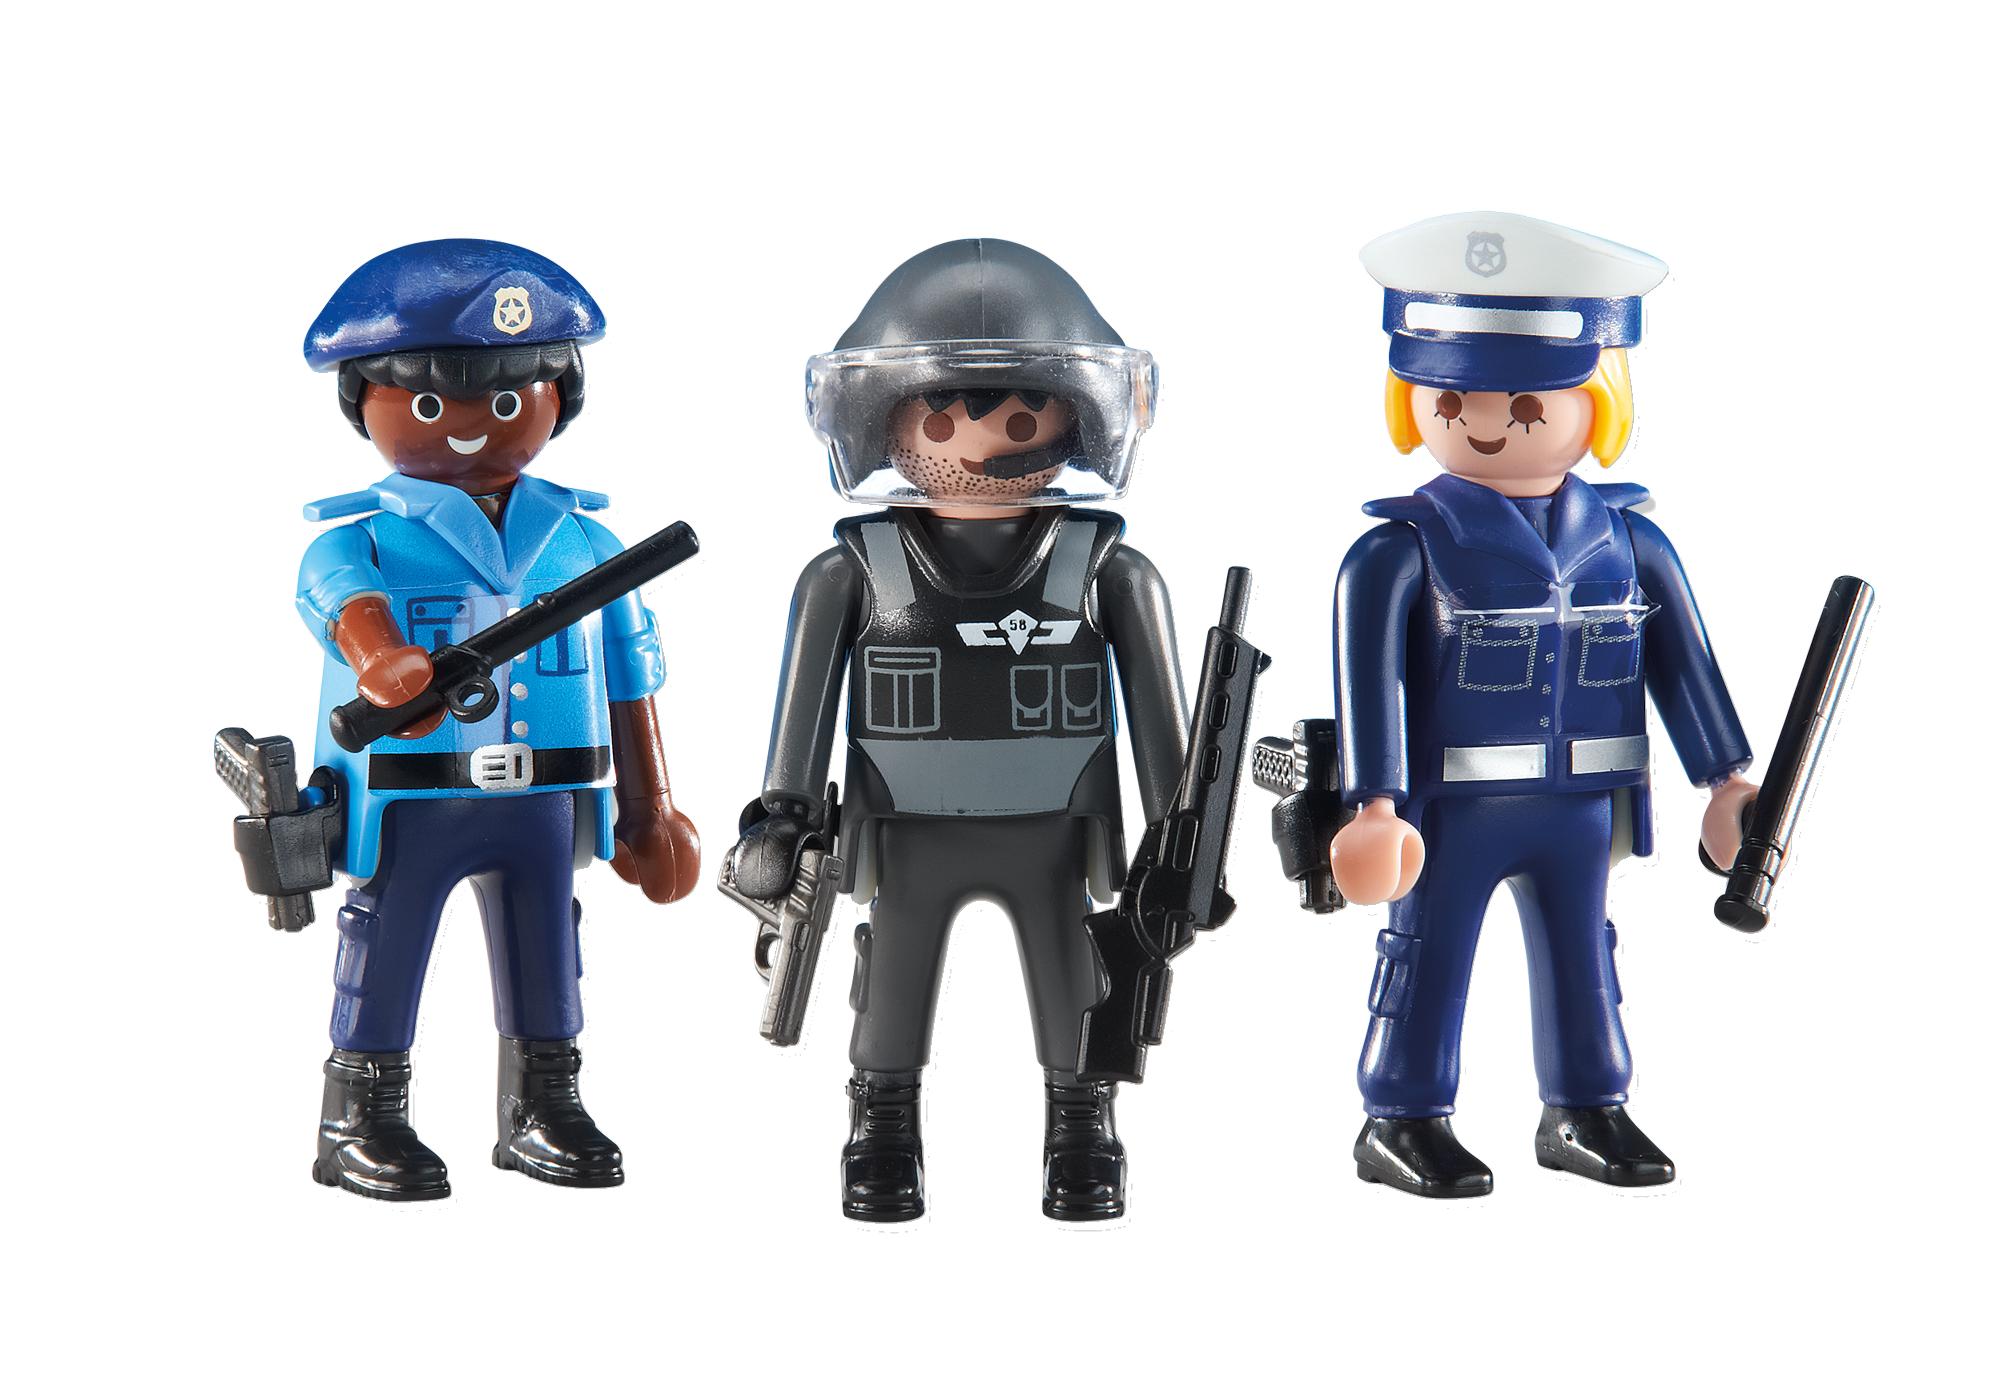 http://media.playmobil.com/i/playmobil/6501_product_detail/3 Poliziotti